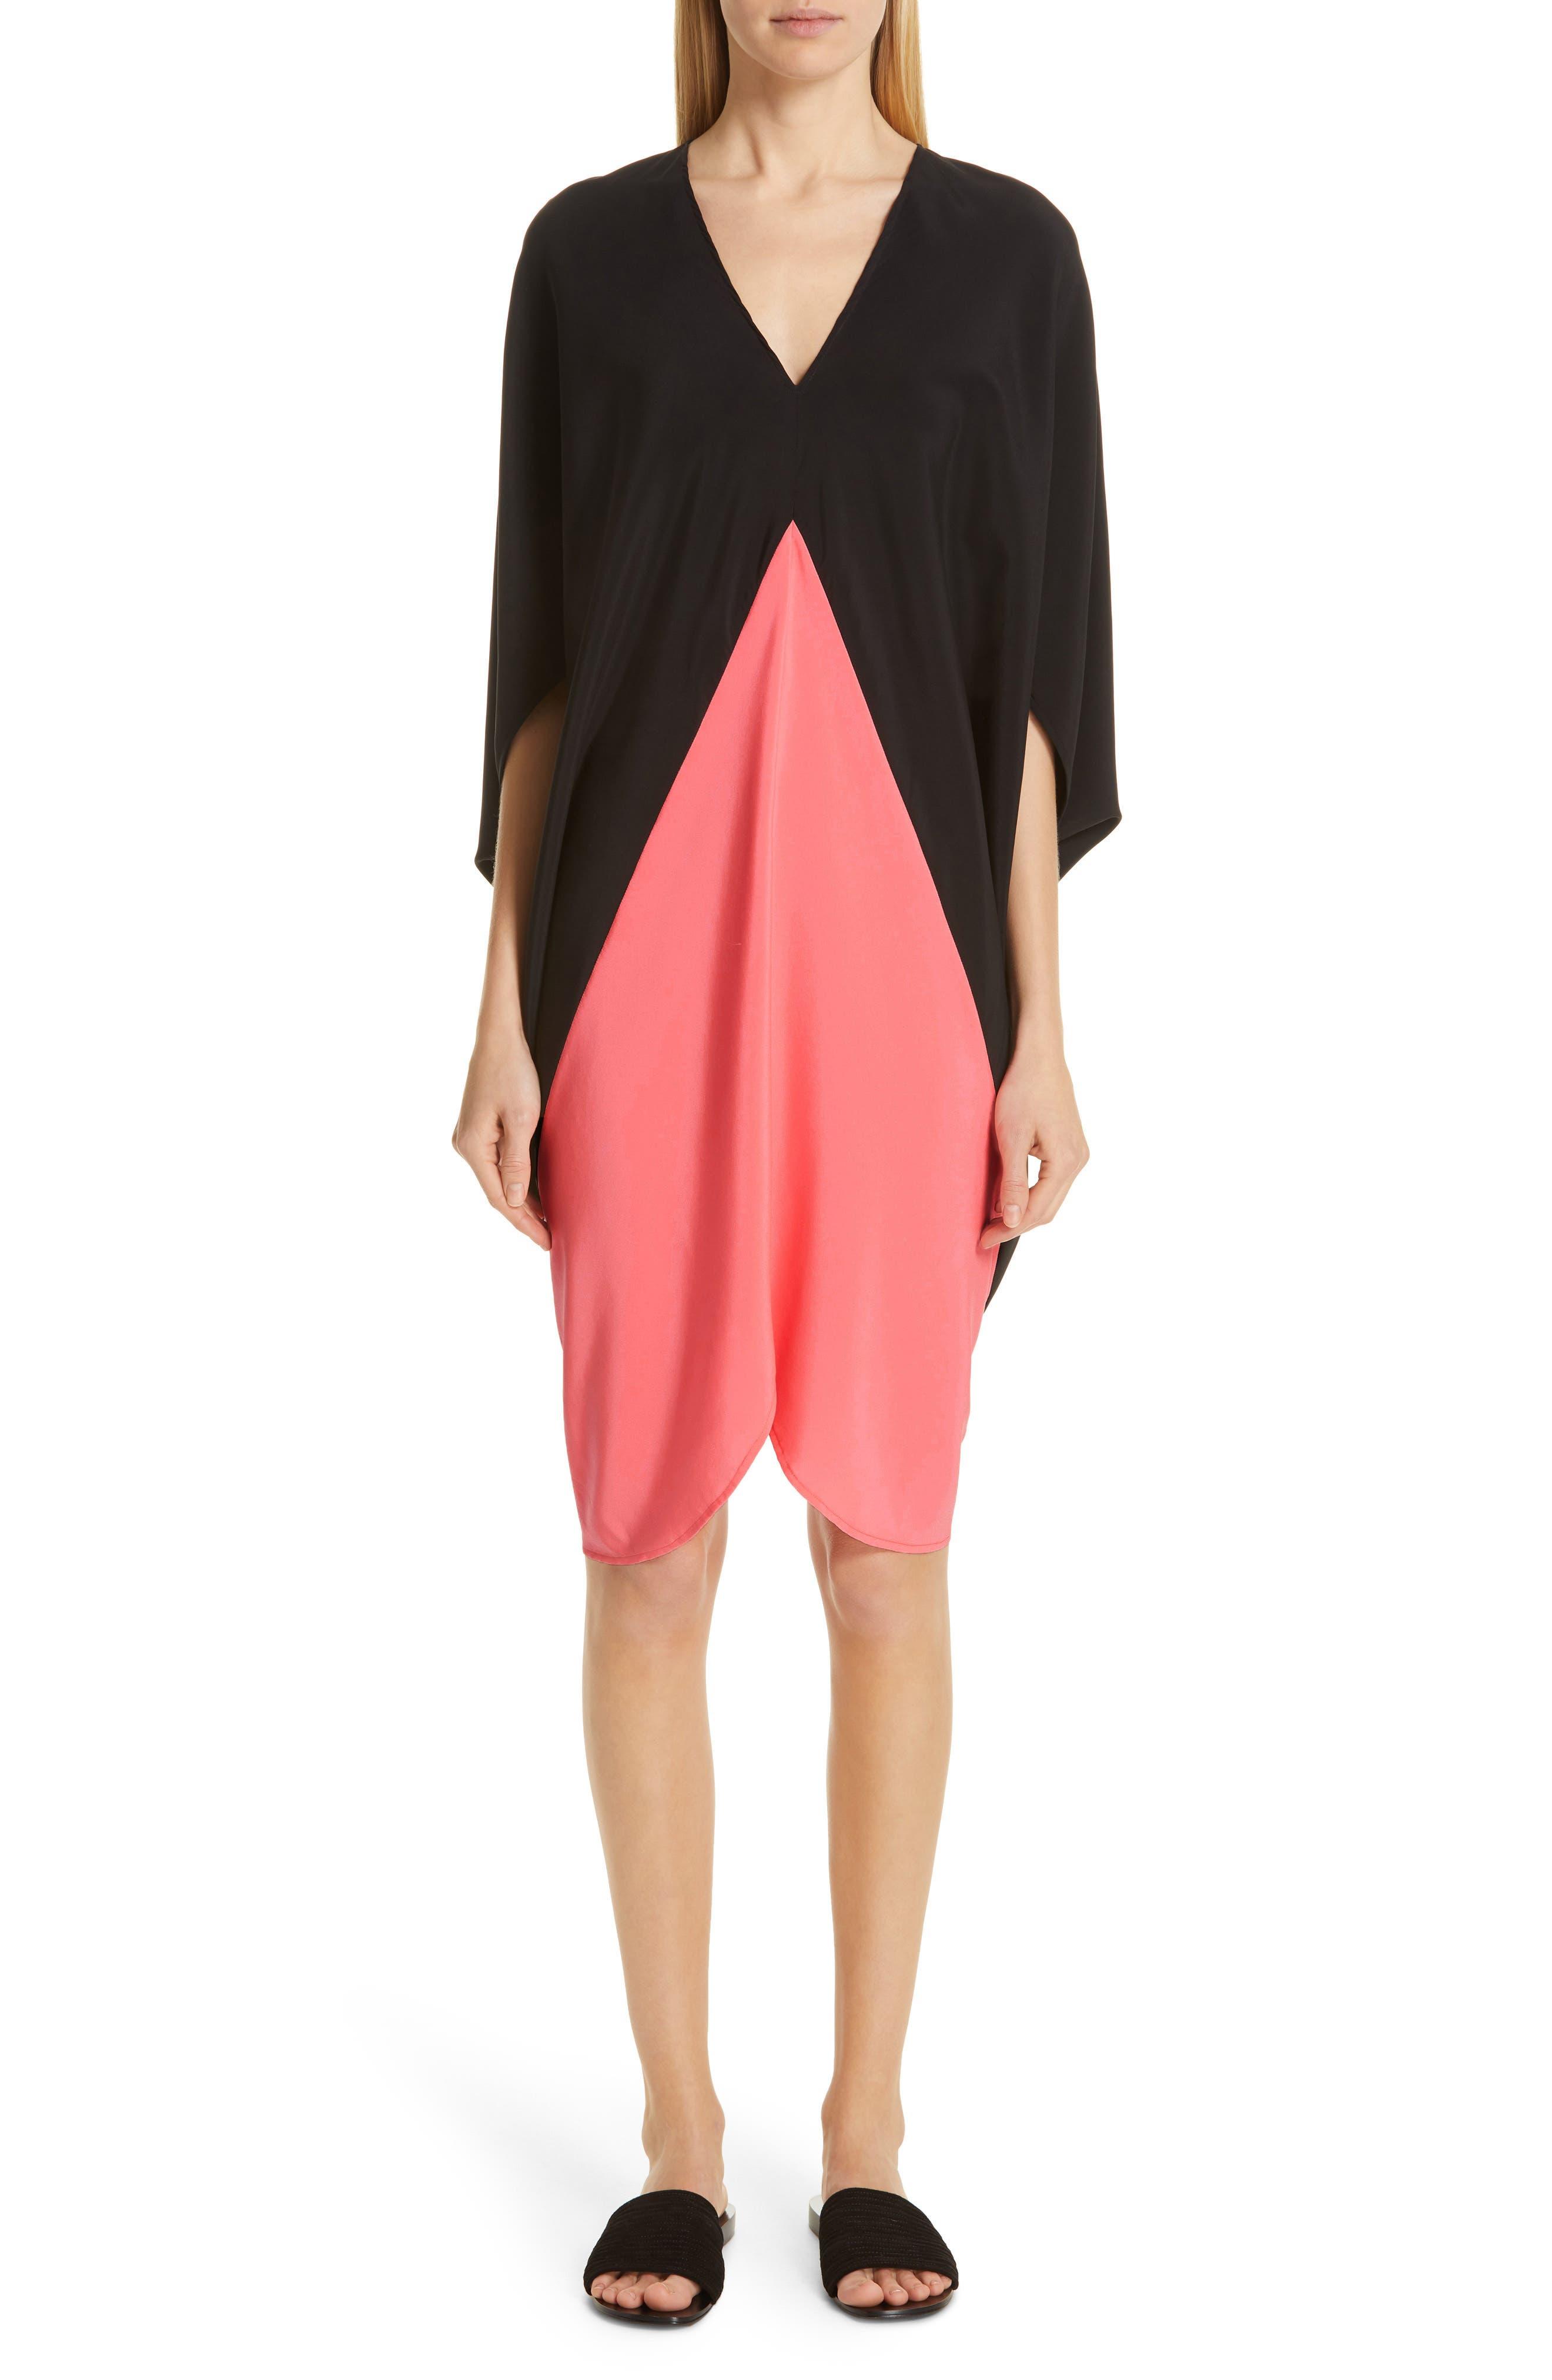 Zero + Maria Cornejo Koya Colorblock Stretch Silk Dress, Black